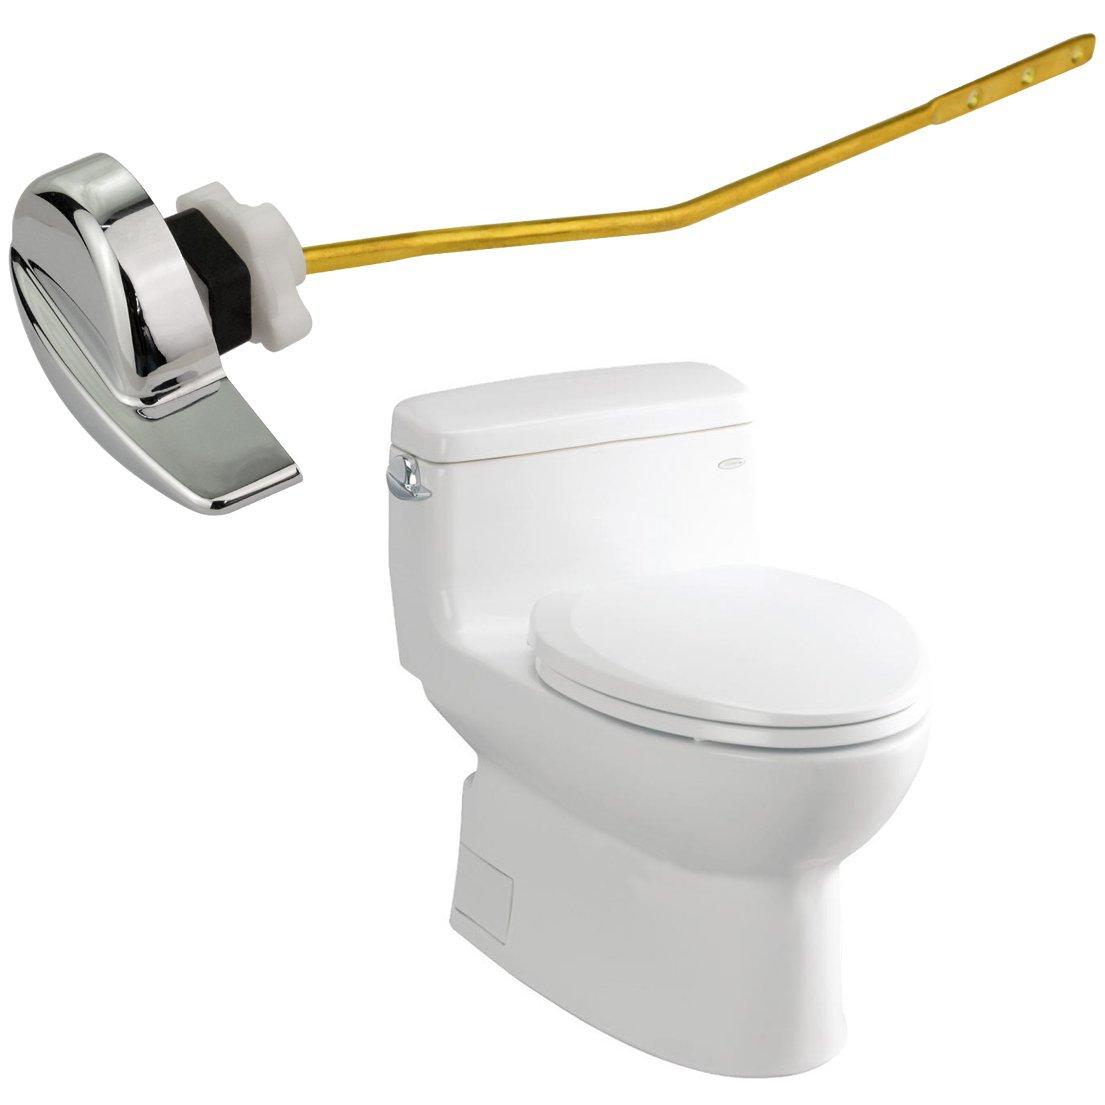 Angle Fitting Side Mount Toilet Lever Handle for TOTO Kohler Toilet Tank White